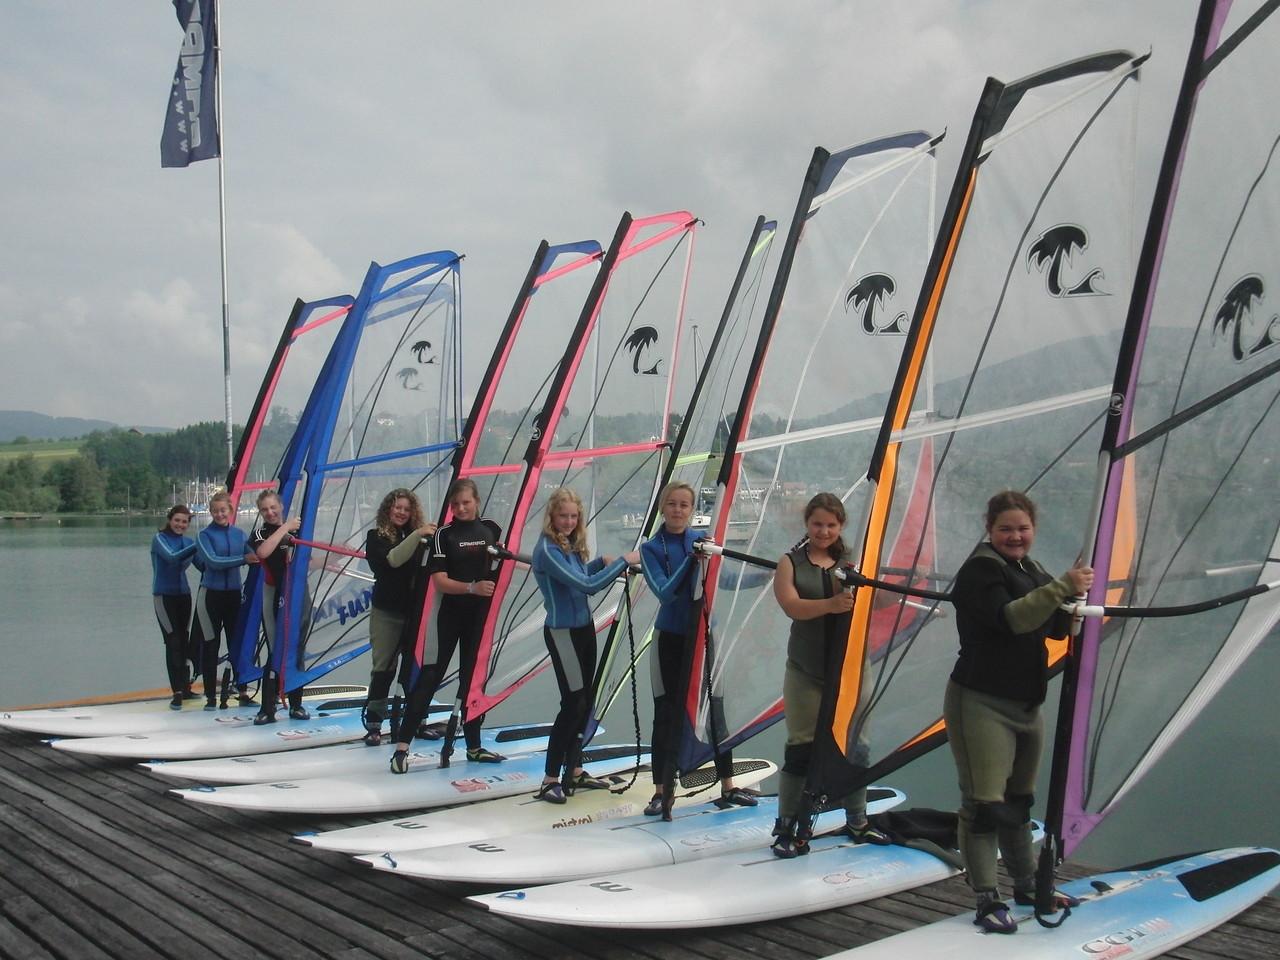 Segel- und Windsurfschule